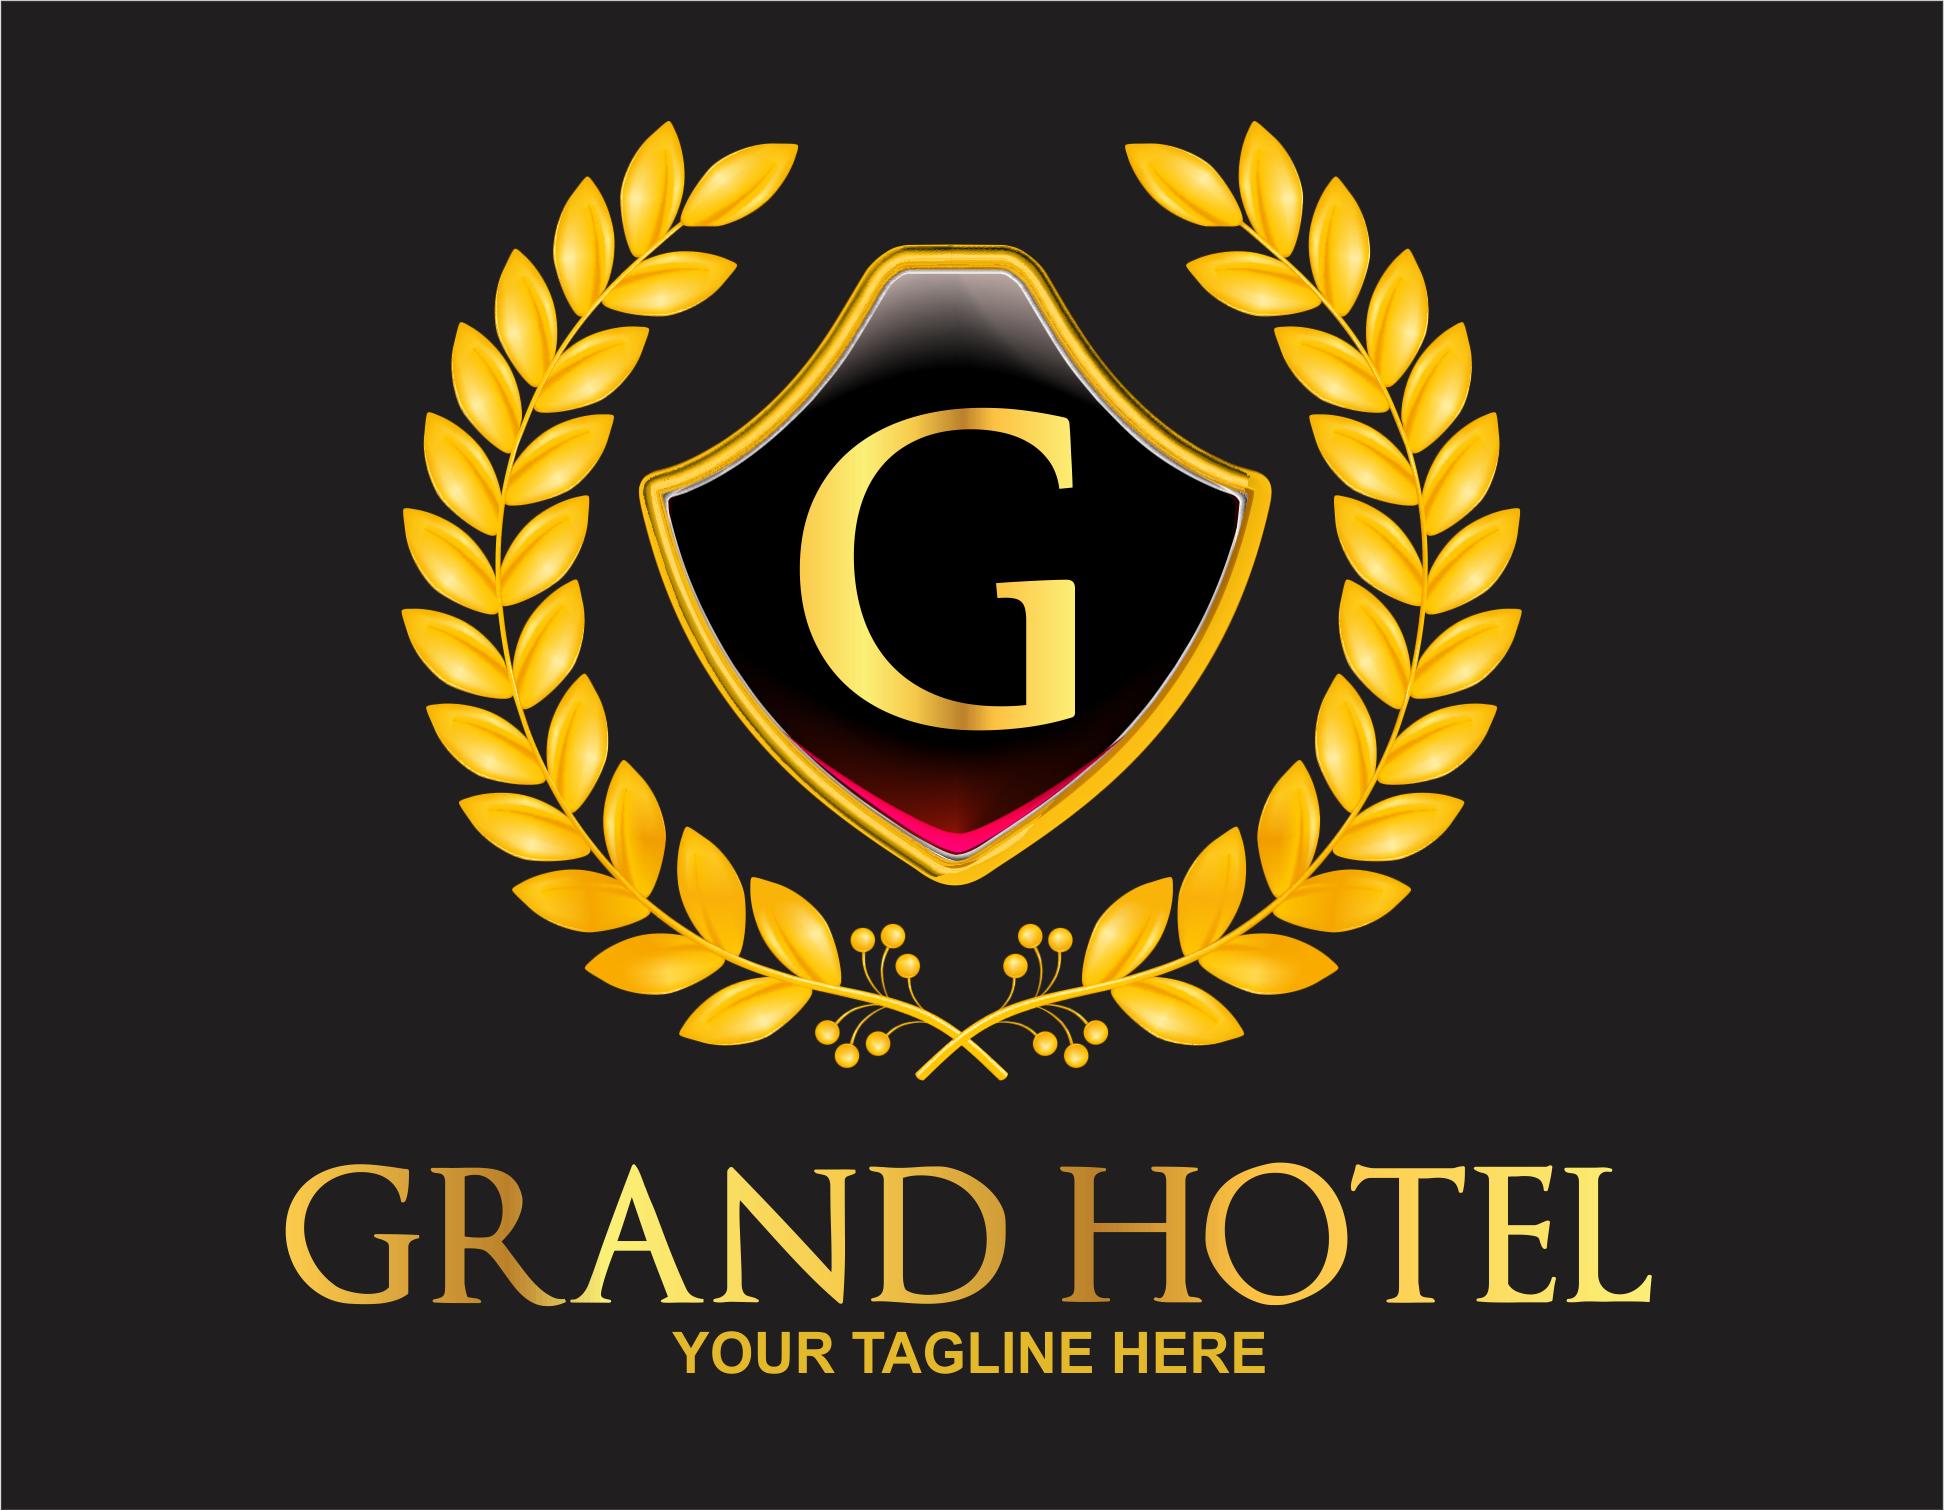 Hotel Logo Vector - Sinopec Vector, Transparent background PNG HD thumbnail